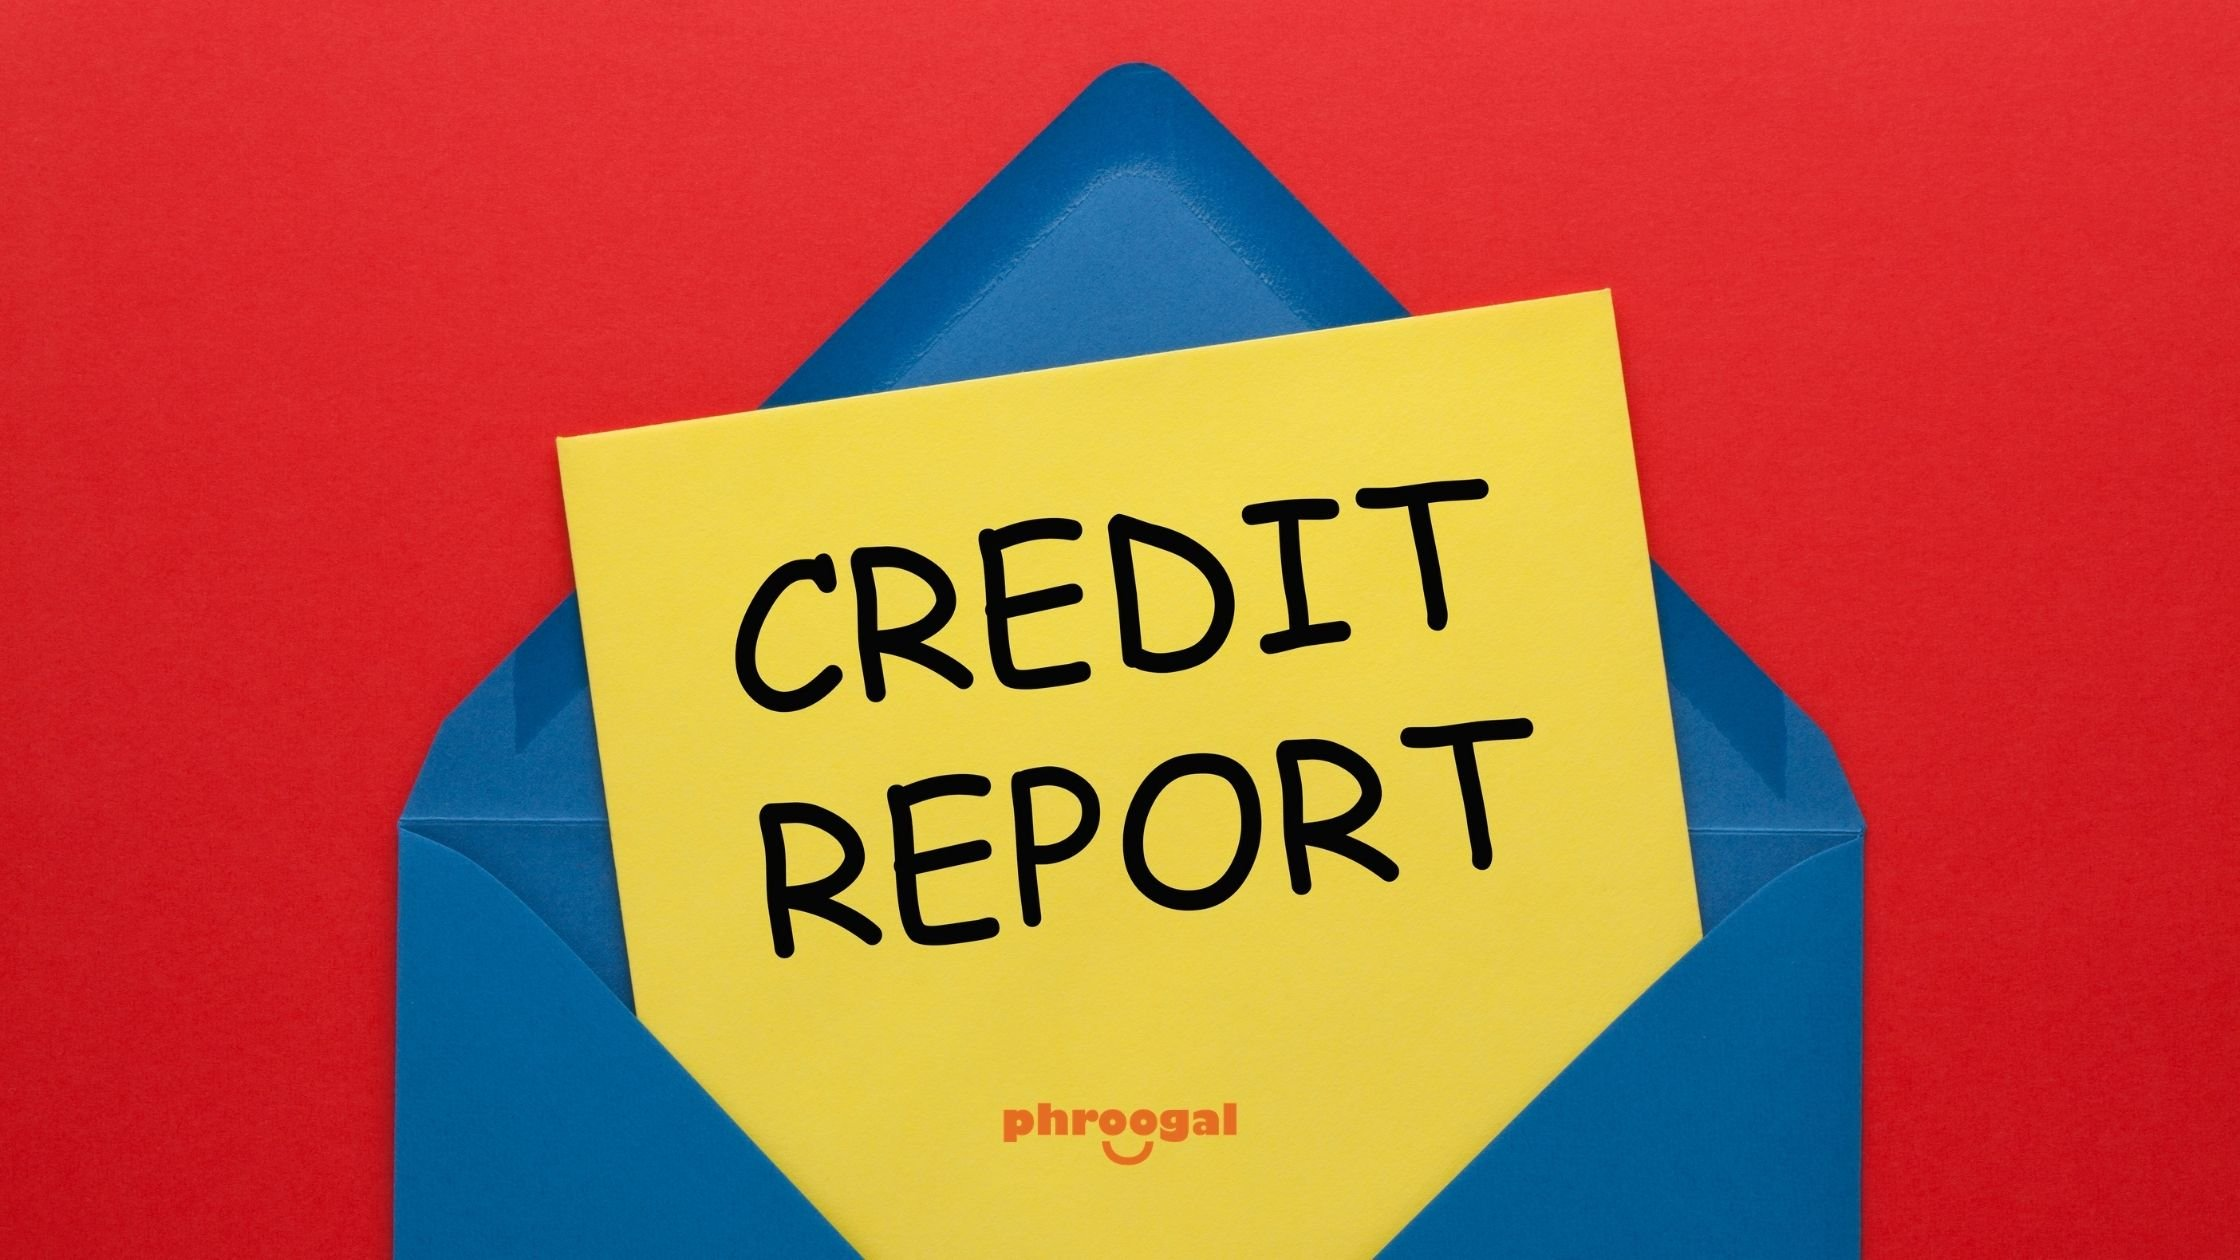 Dispute Credit Report Errors Online phroogal